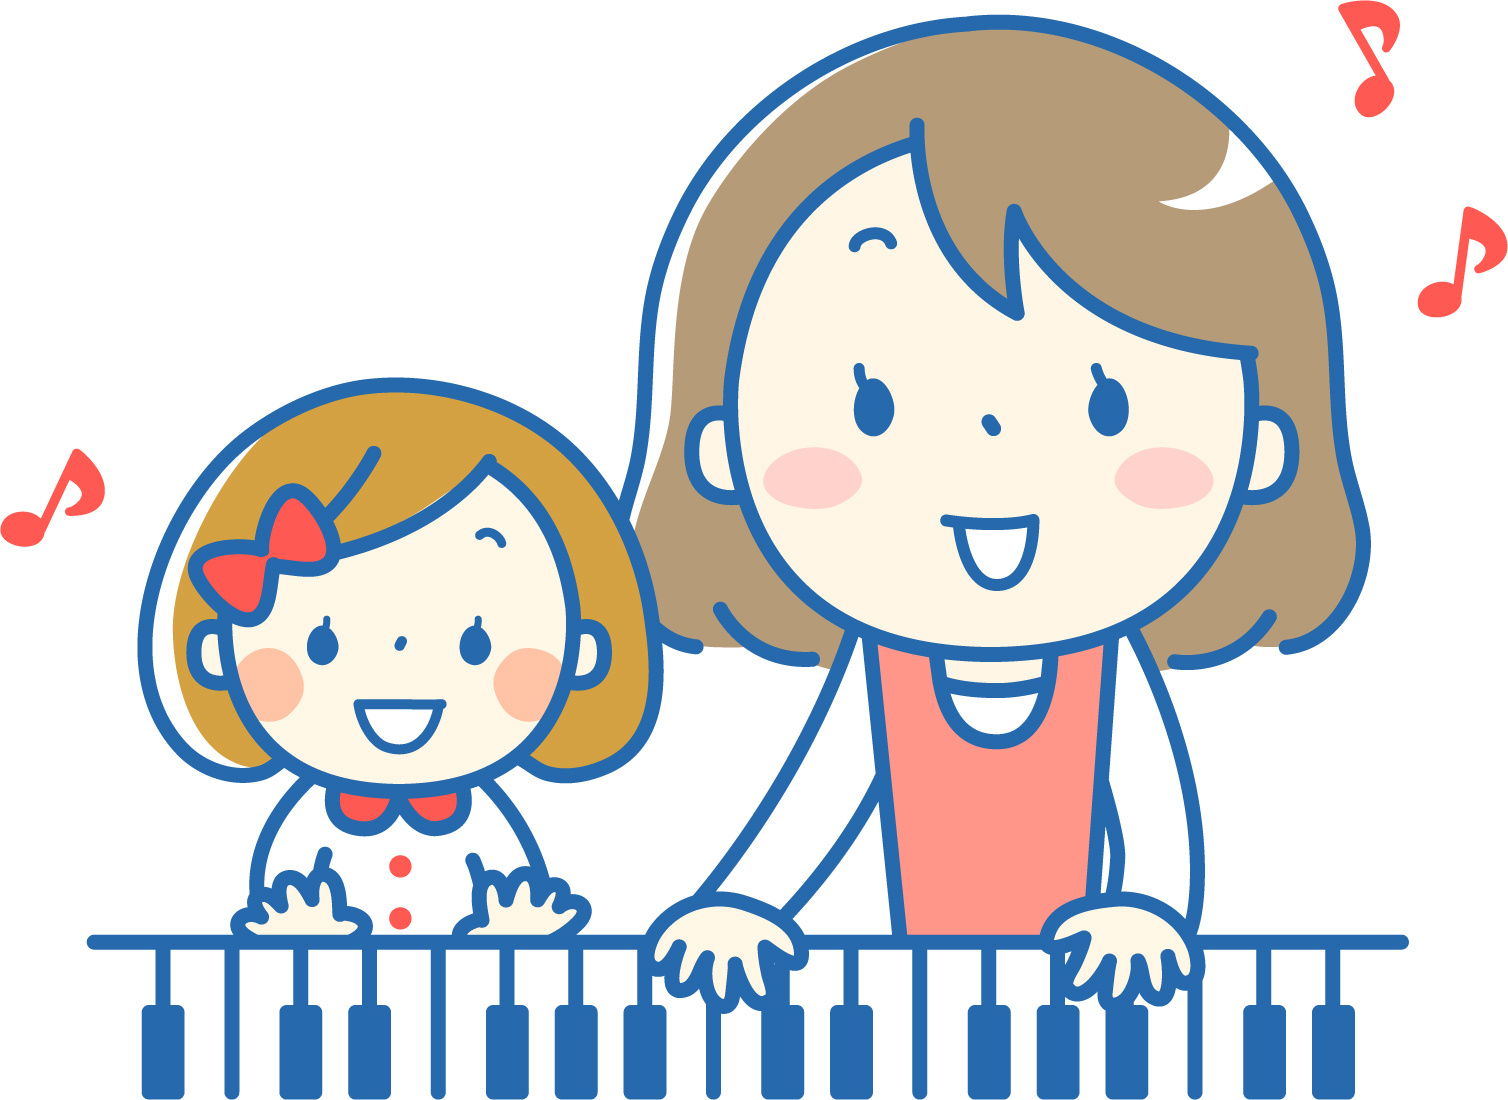 Tokyo Piano Solutionのイメージ